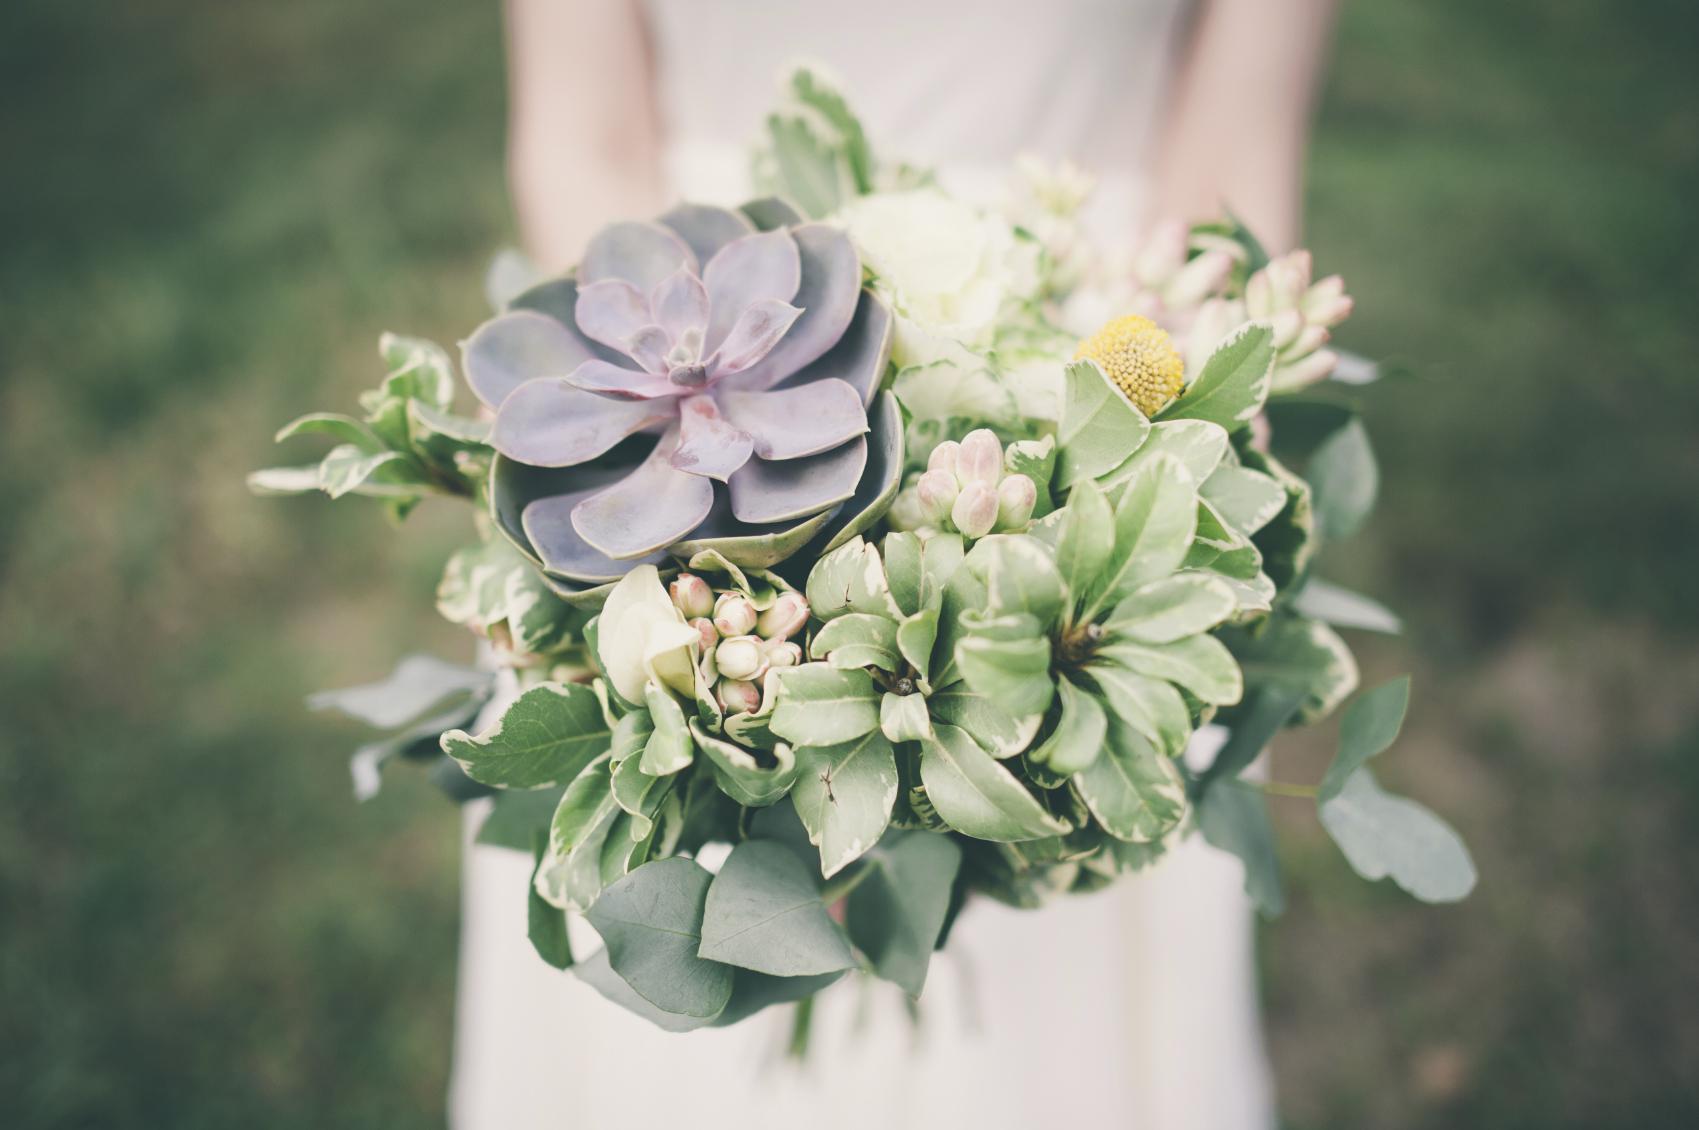 21 trends for a spring or summer wedding omni hotels resorts blog istock000034946234medium izmirmasajfo